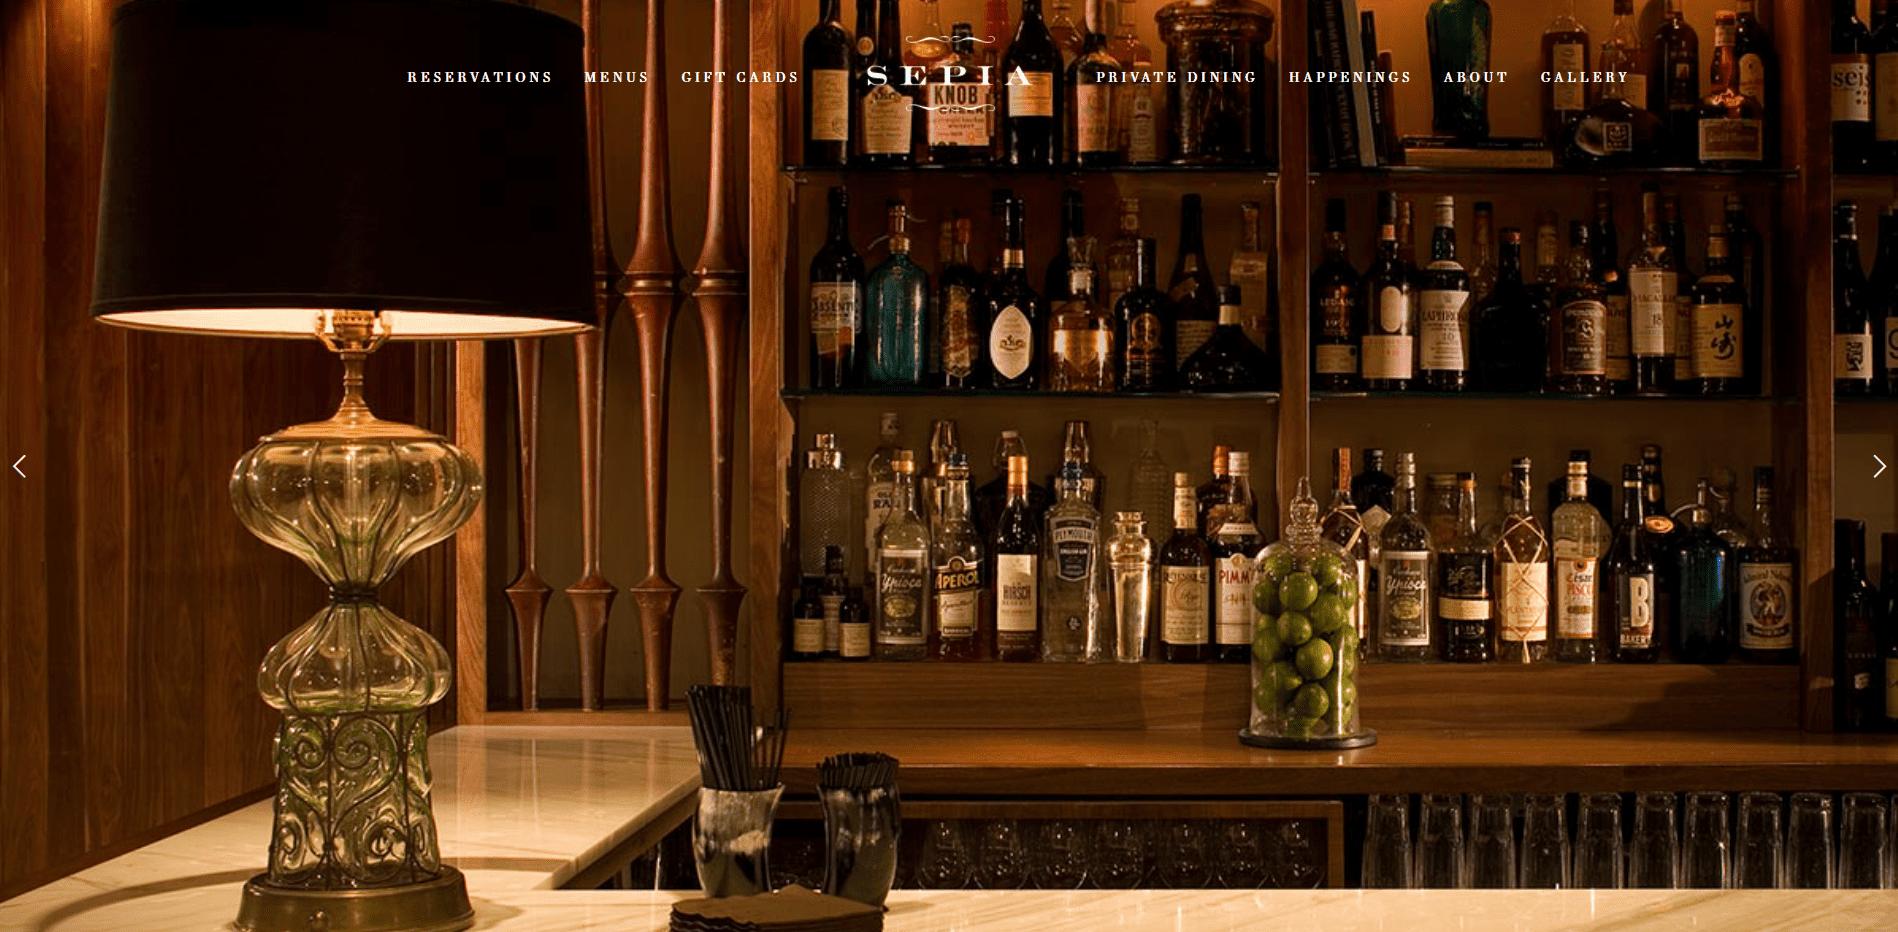 Sepia restaurant websites